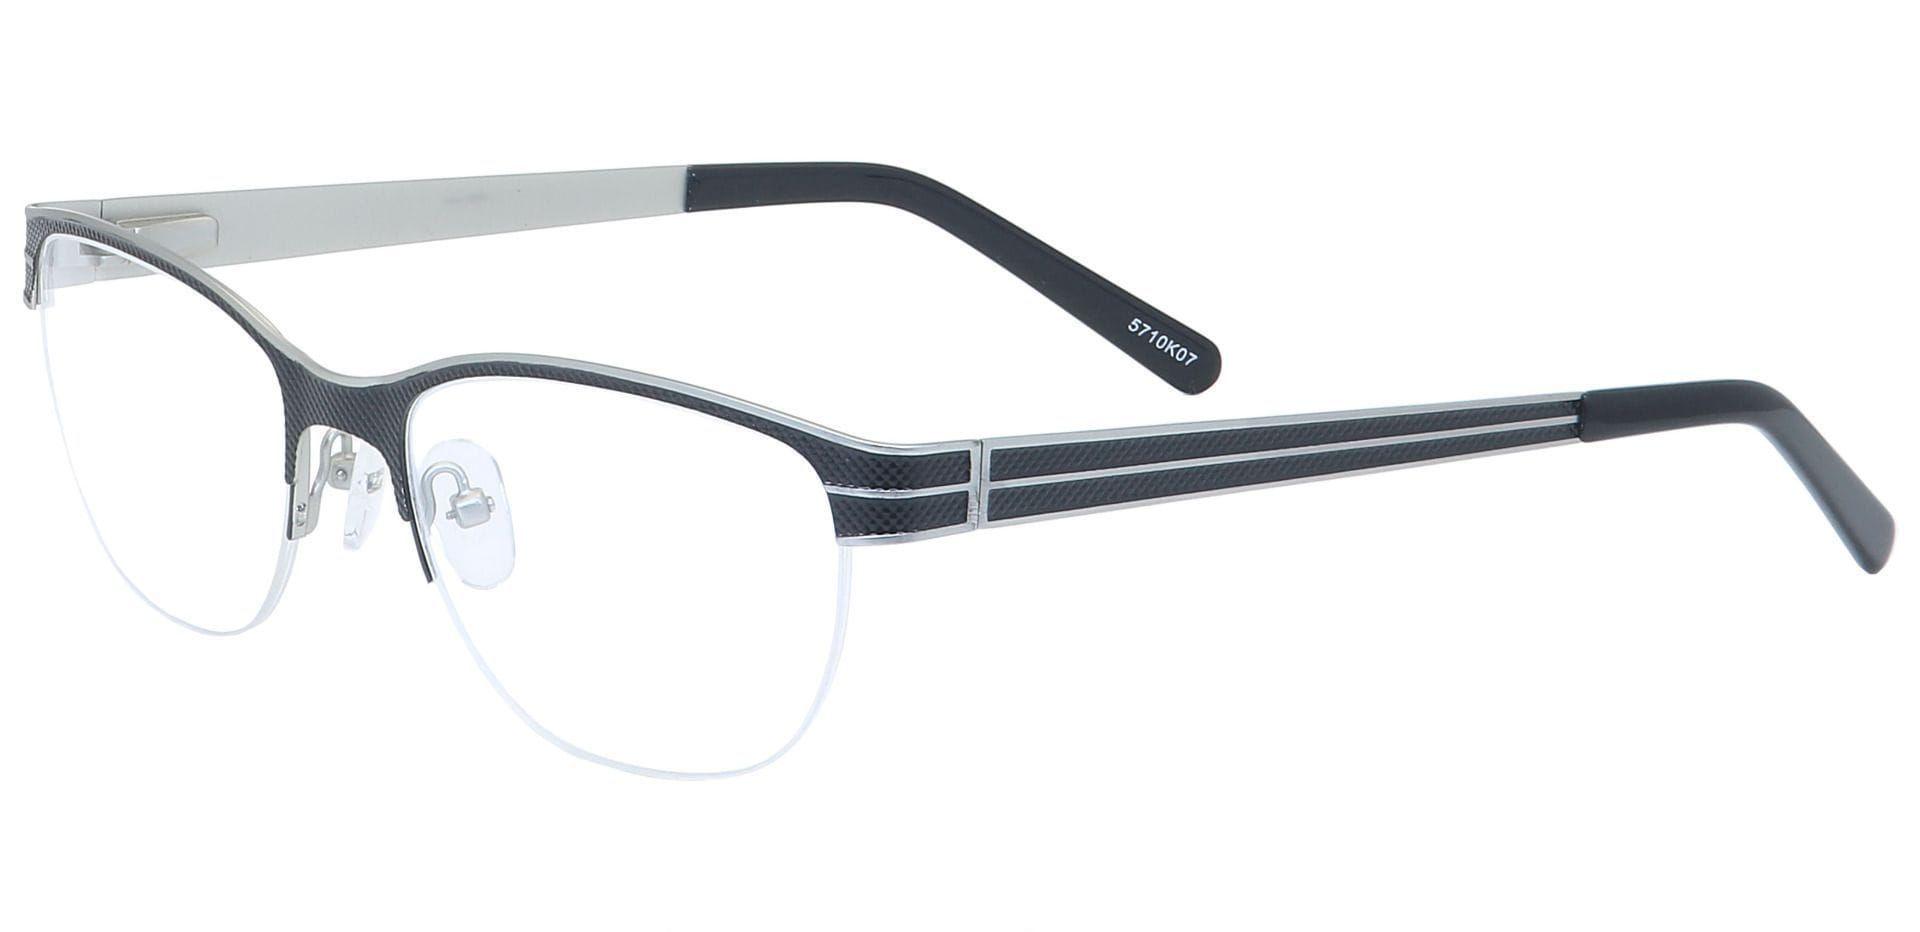 Arren Round Blue Light Blocking Glasses - White